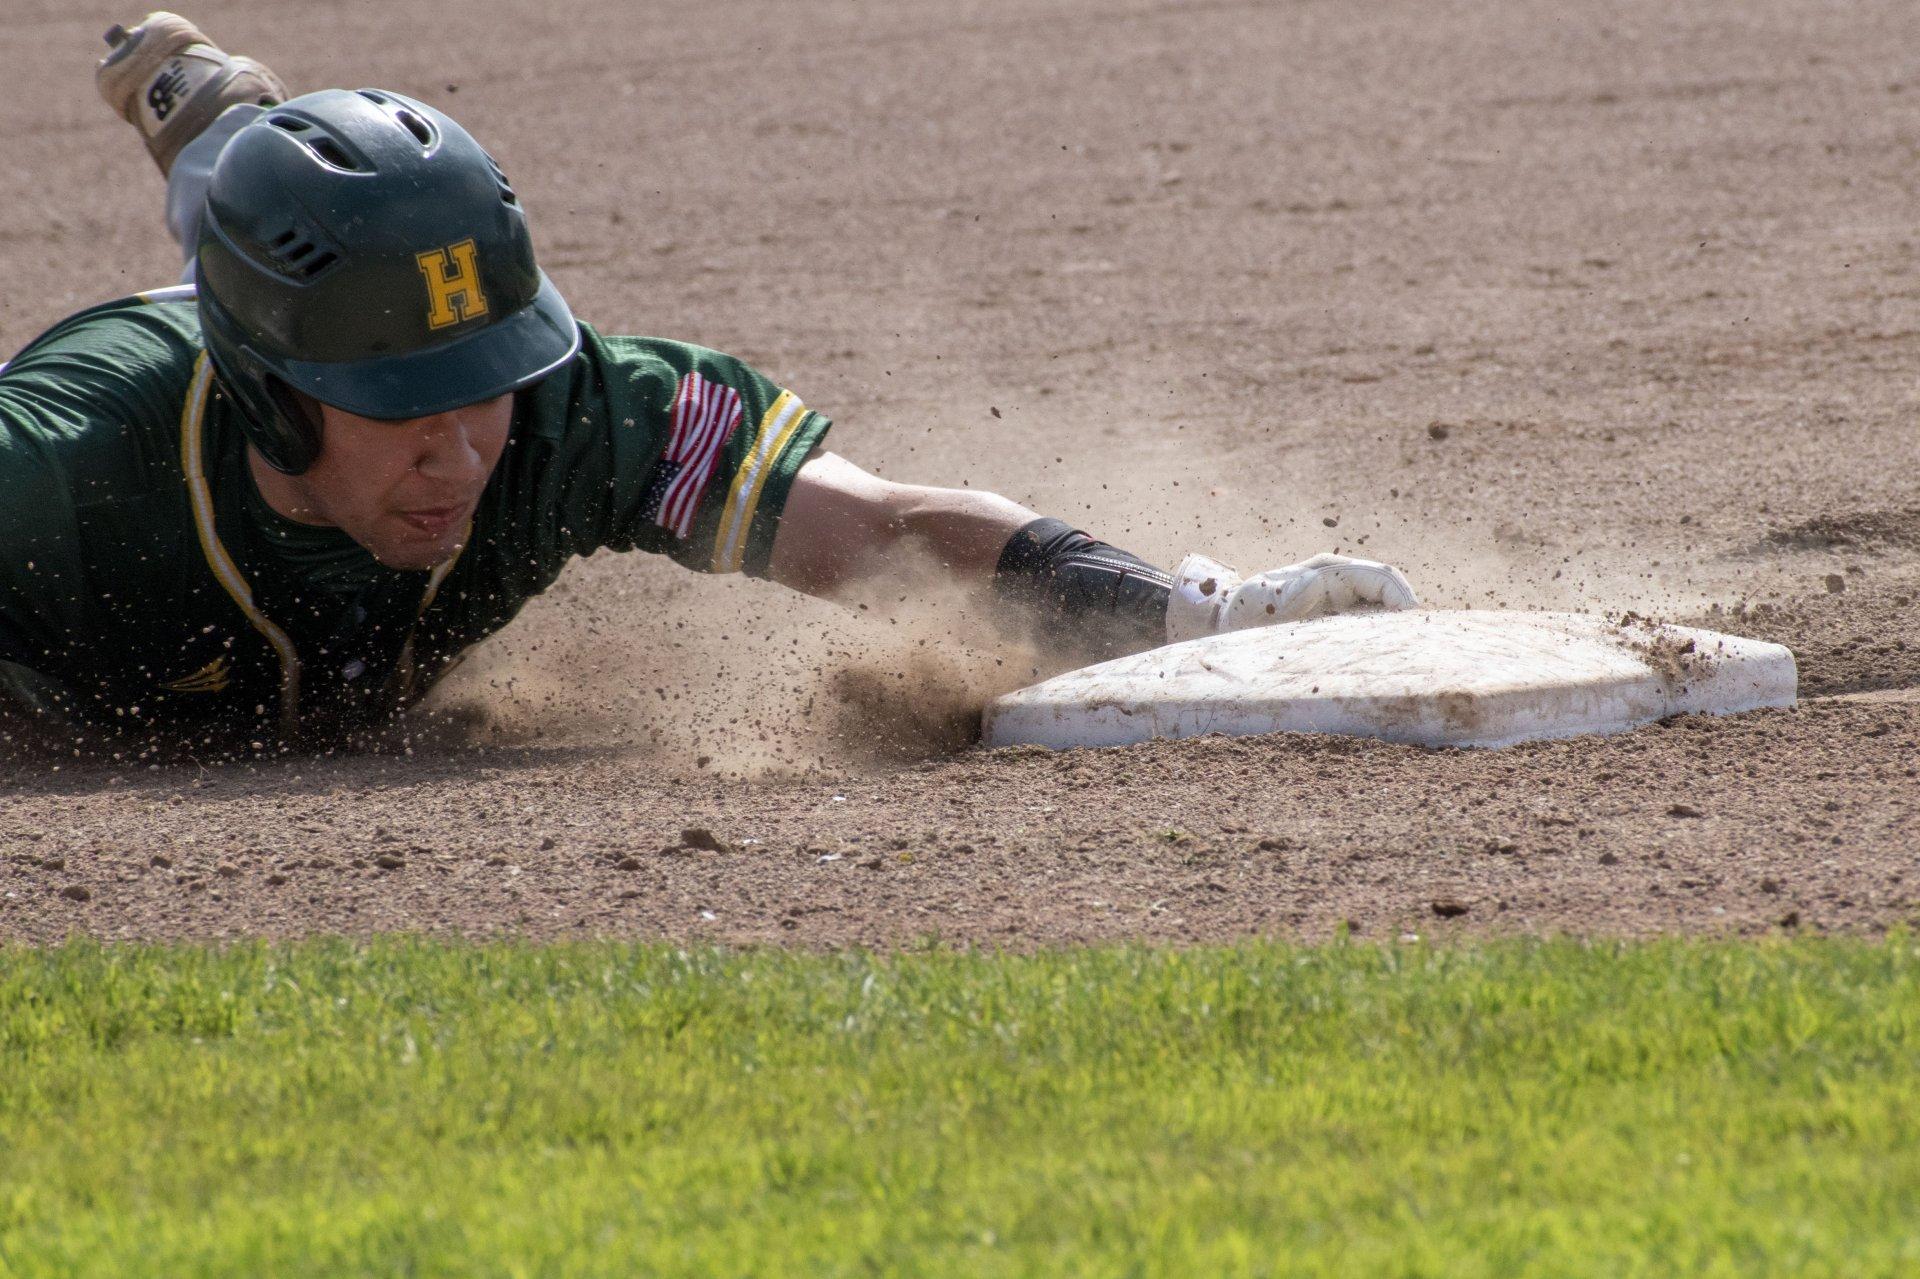 Jacks baserunner Alejandro Caravalho slides into third base during the HSU club baseball game on September 28th, 2019 at the Arcata Ball Park | Photo by Liam Warner